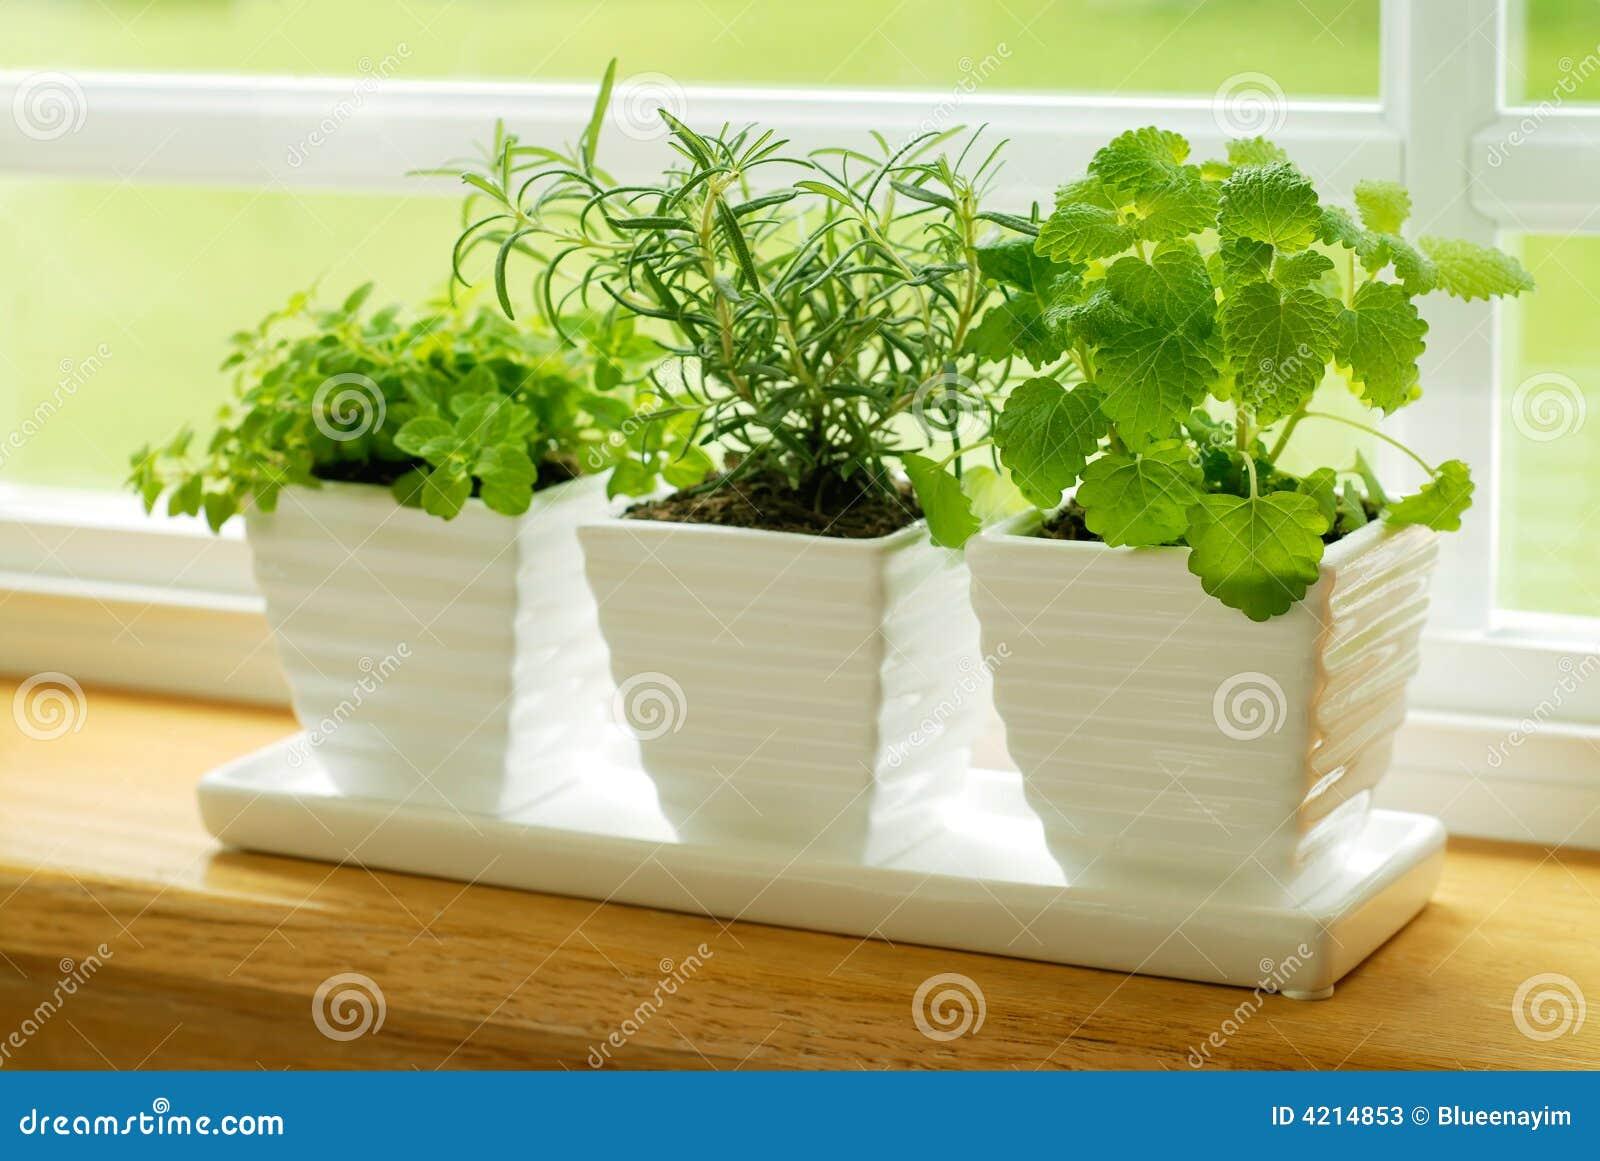 Different herbs royalty free stock image image 16265346 - Balsem